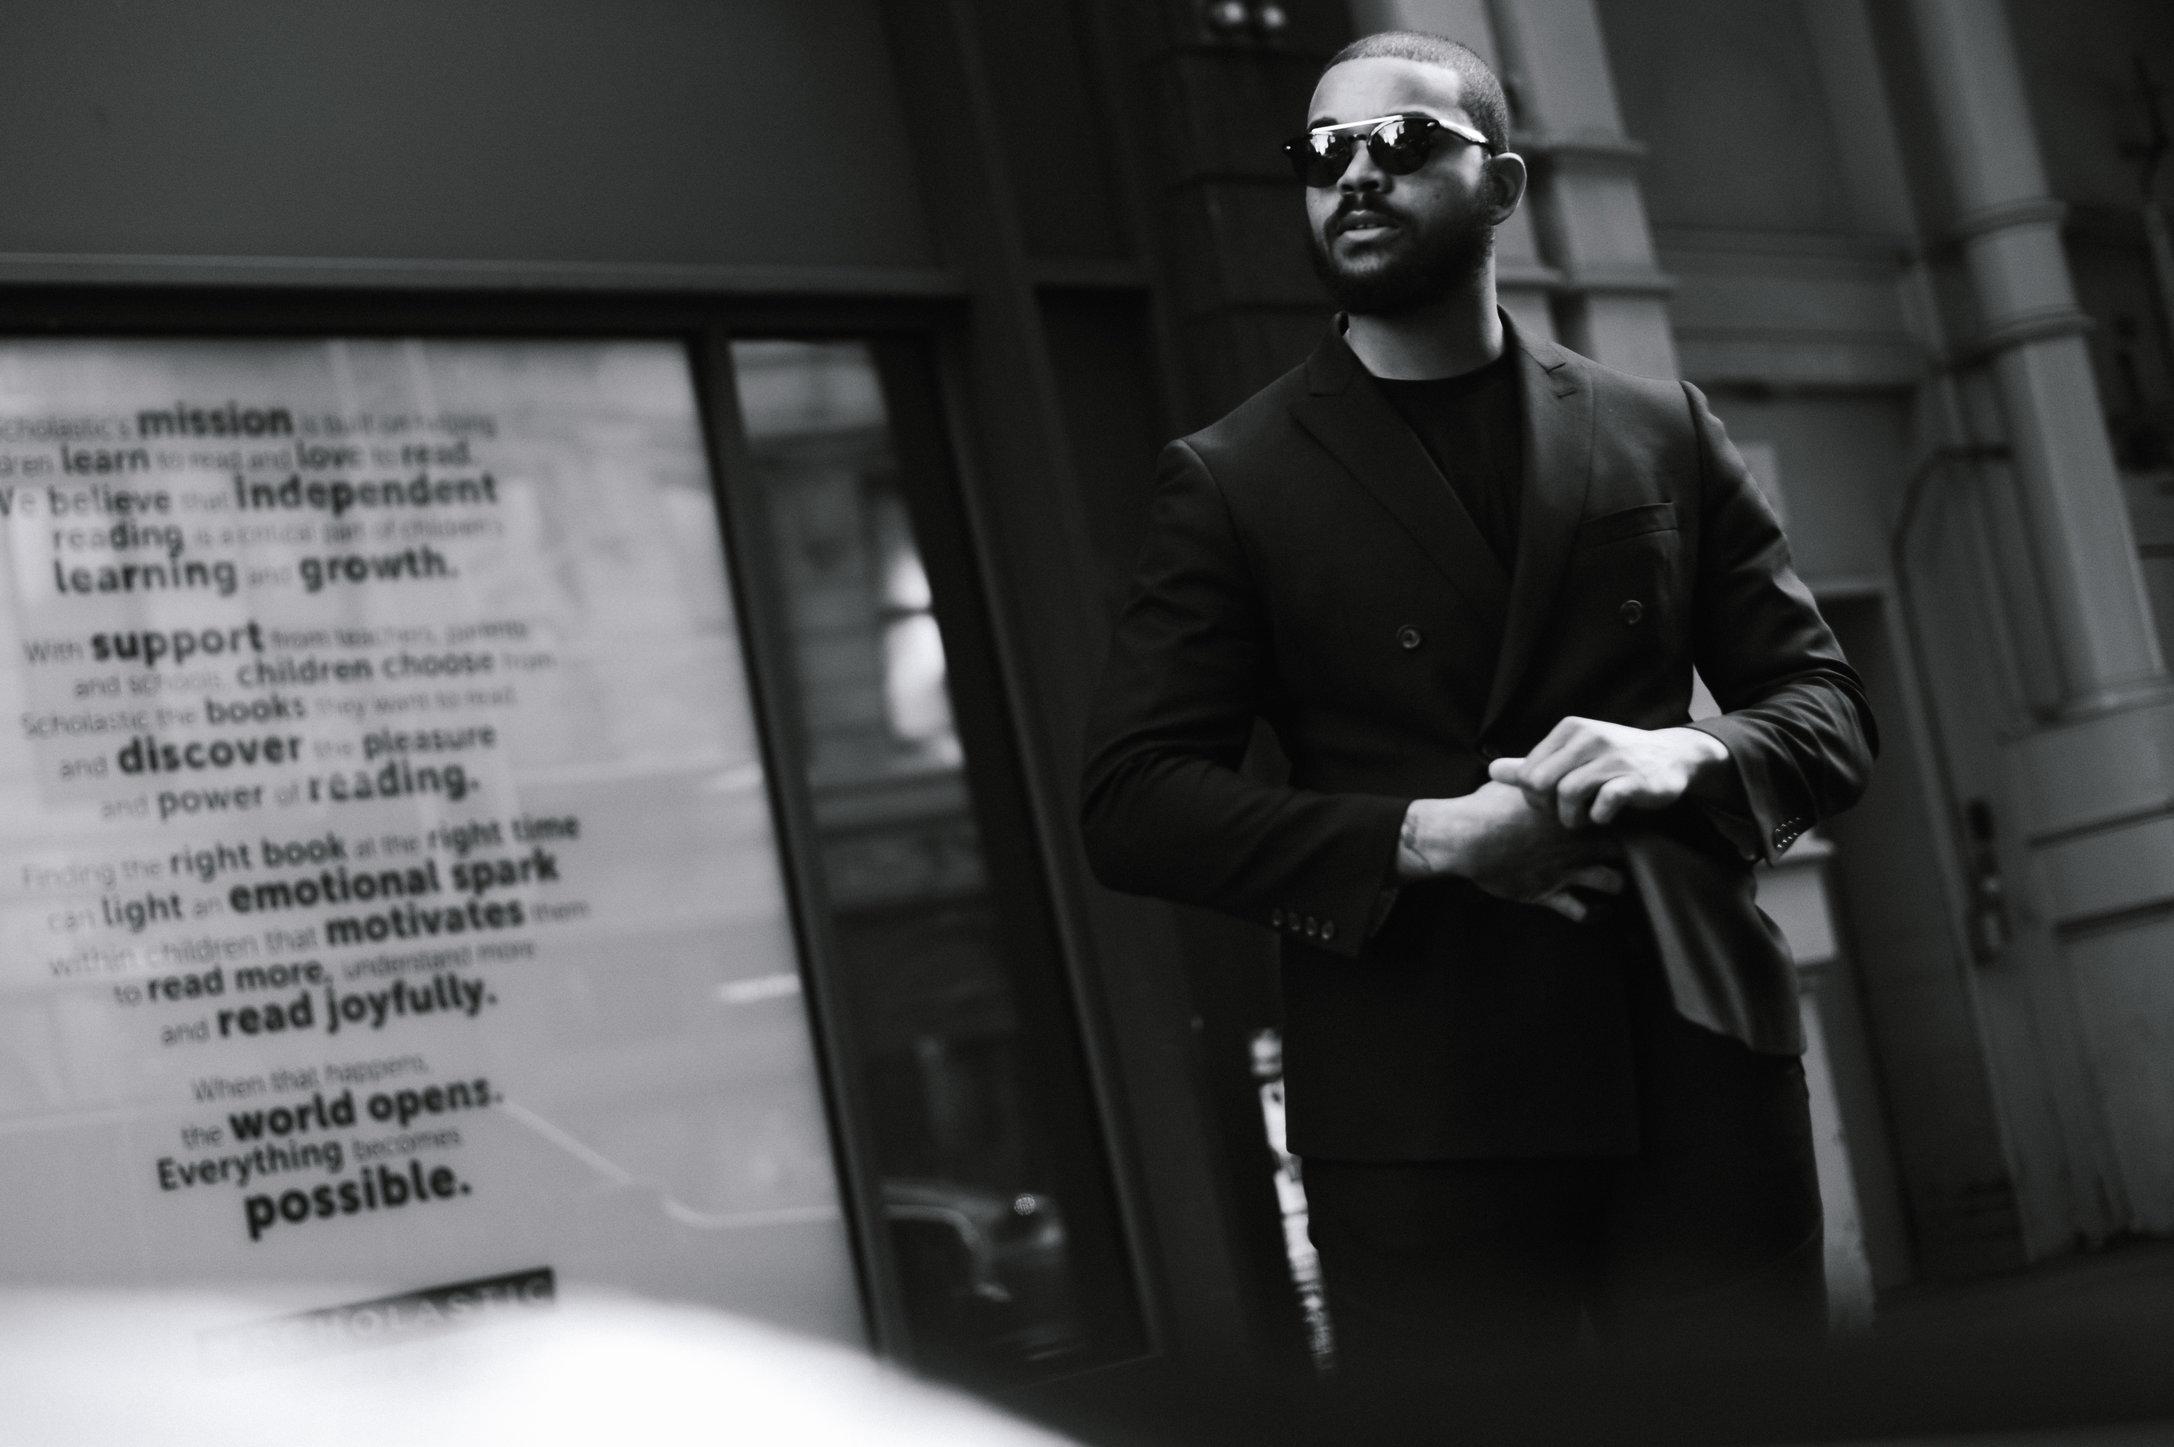 george-elder-photography-naj-wareham-the-new-york-times-2.jpg